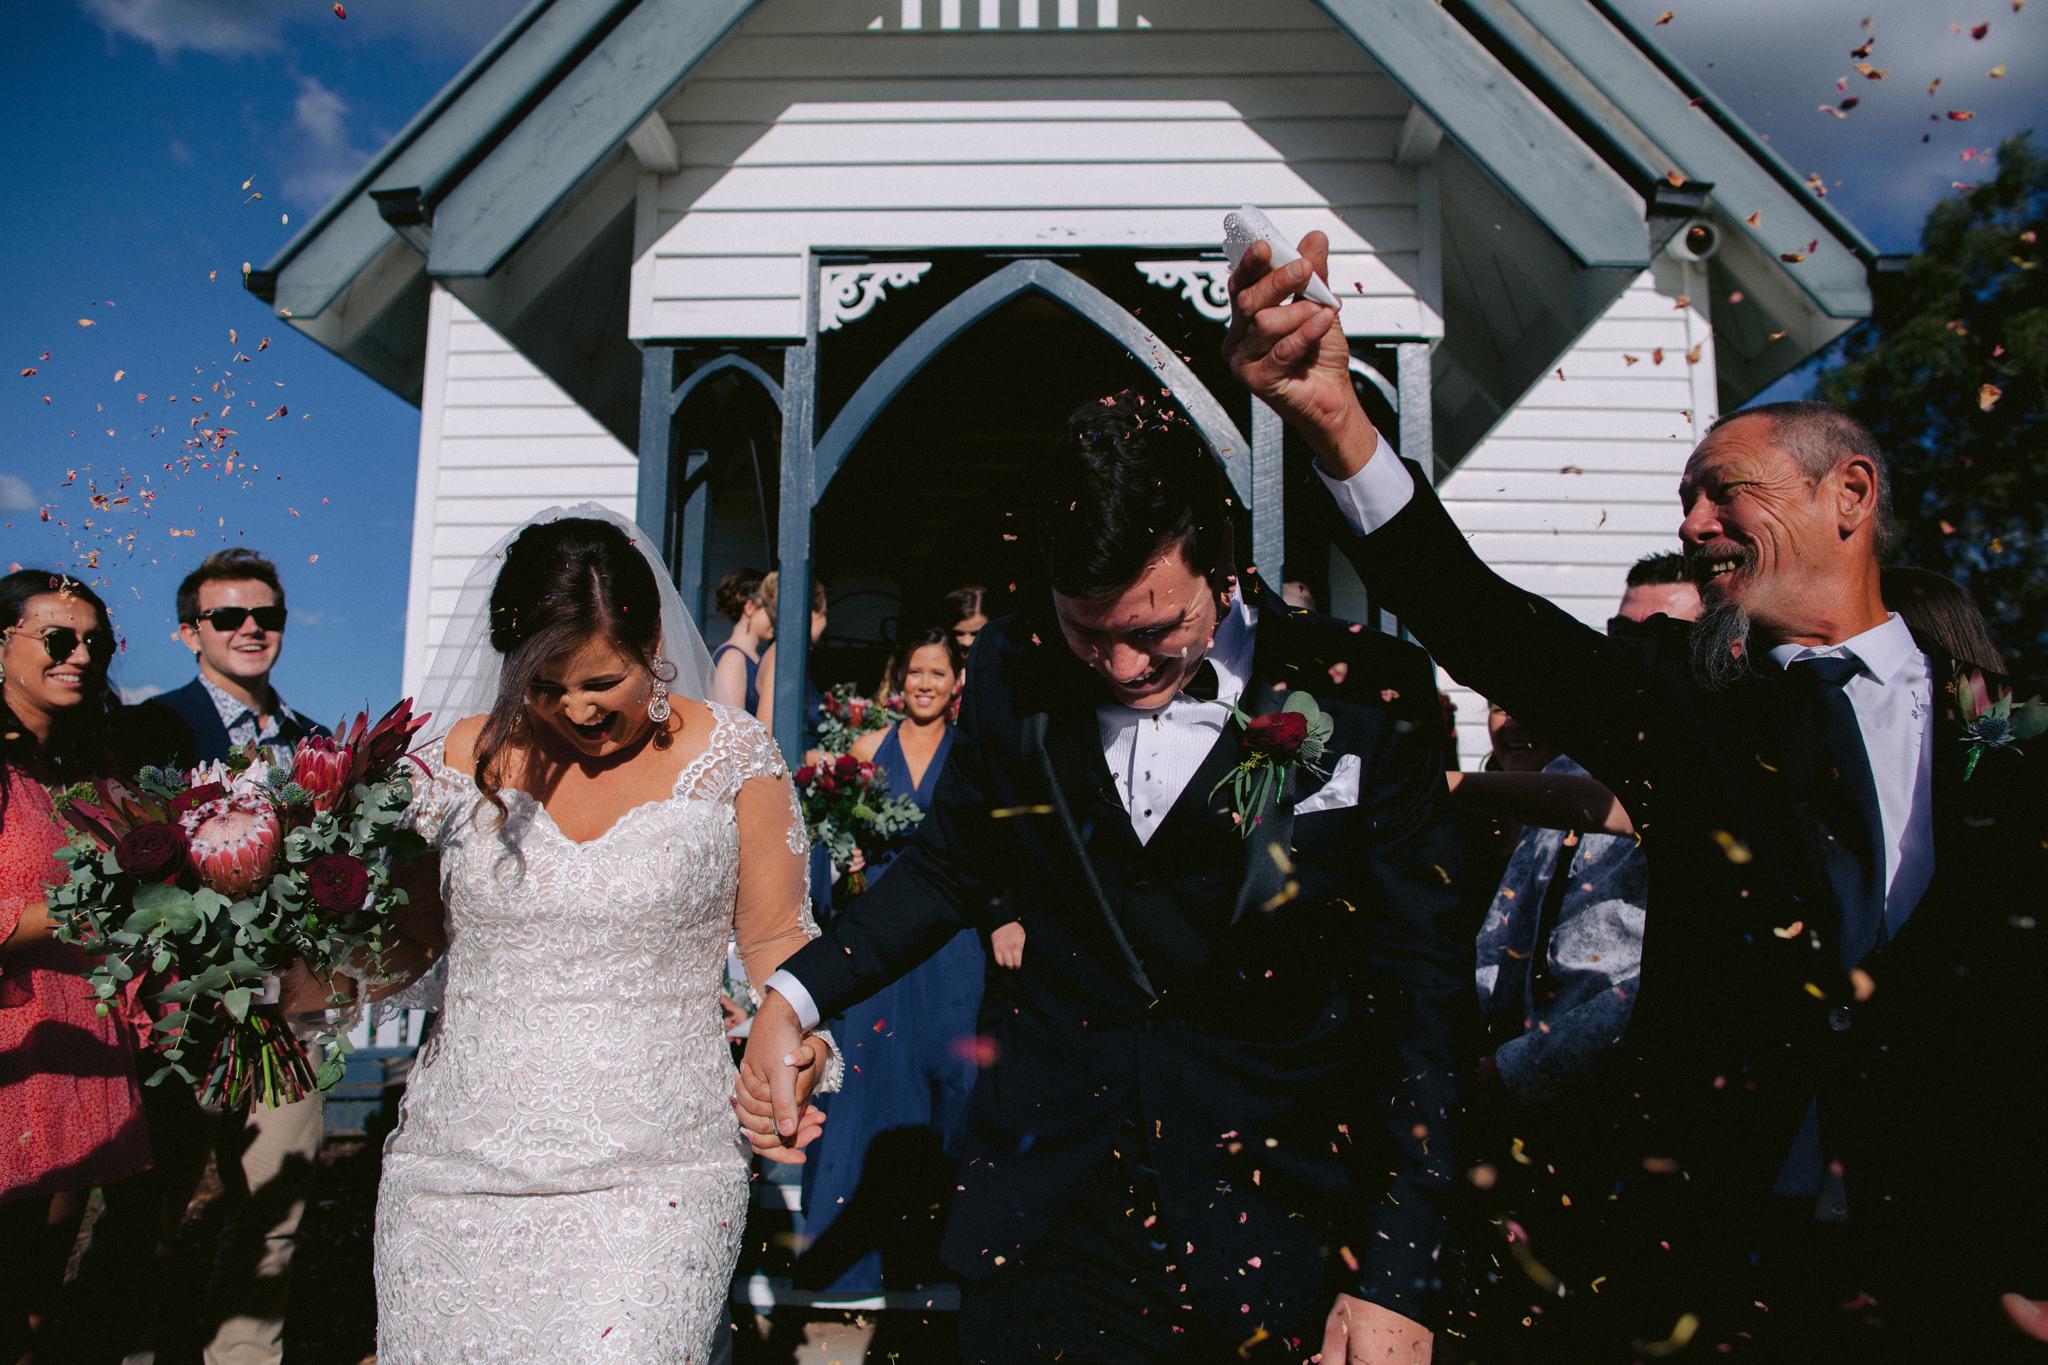 NewBlackStudios_wedding_photography_gallery-44.jpg